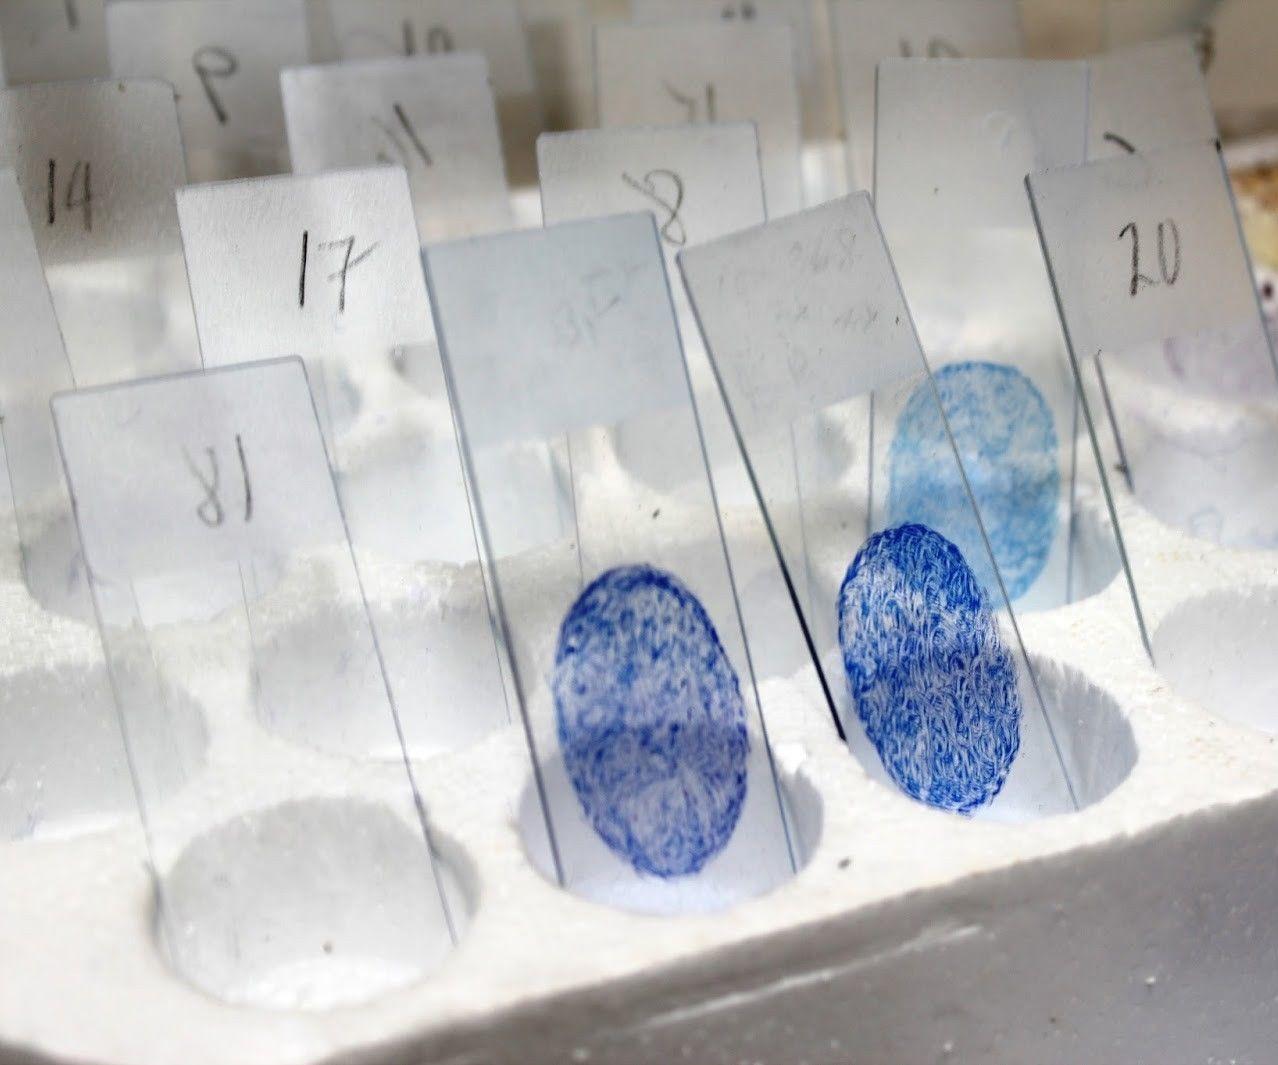 How to make a Ziehl Neelsen Sputum Smear slide